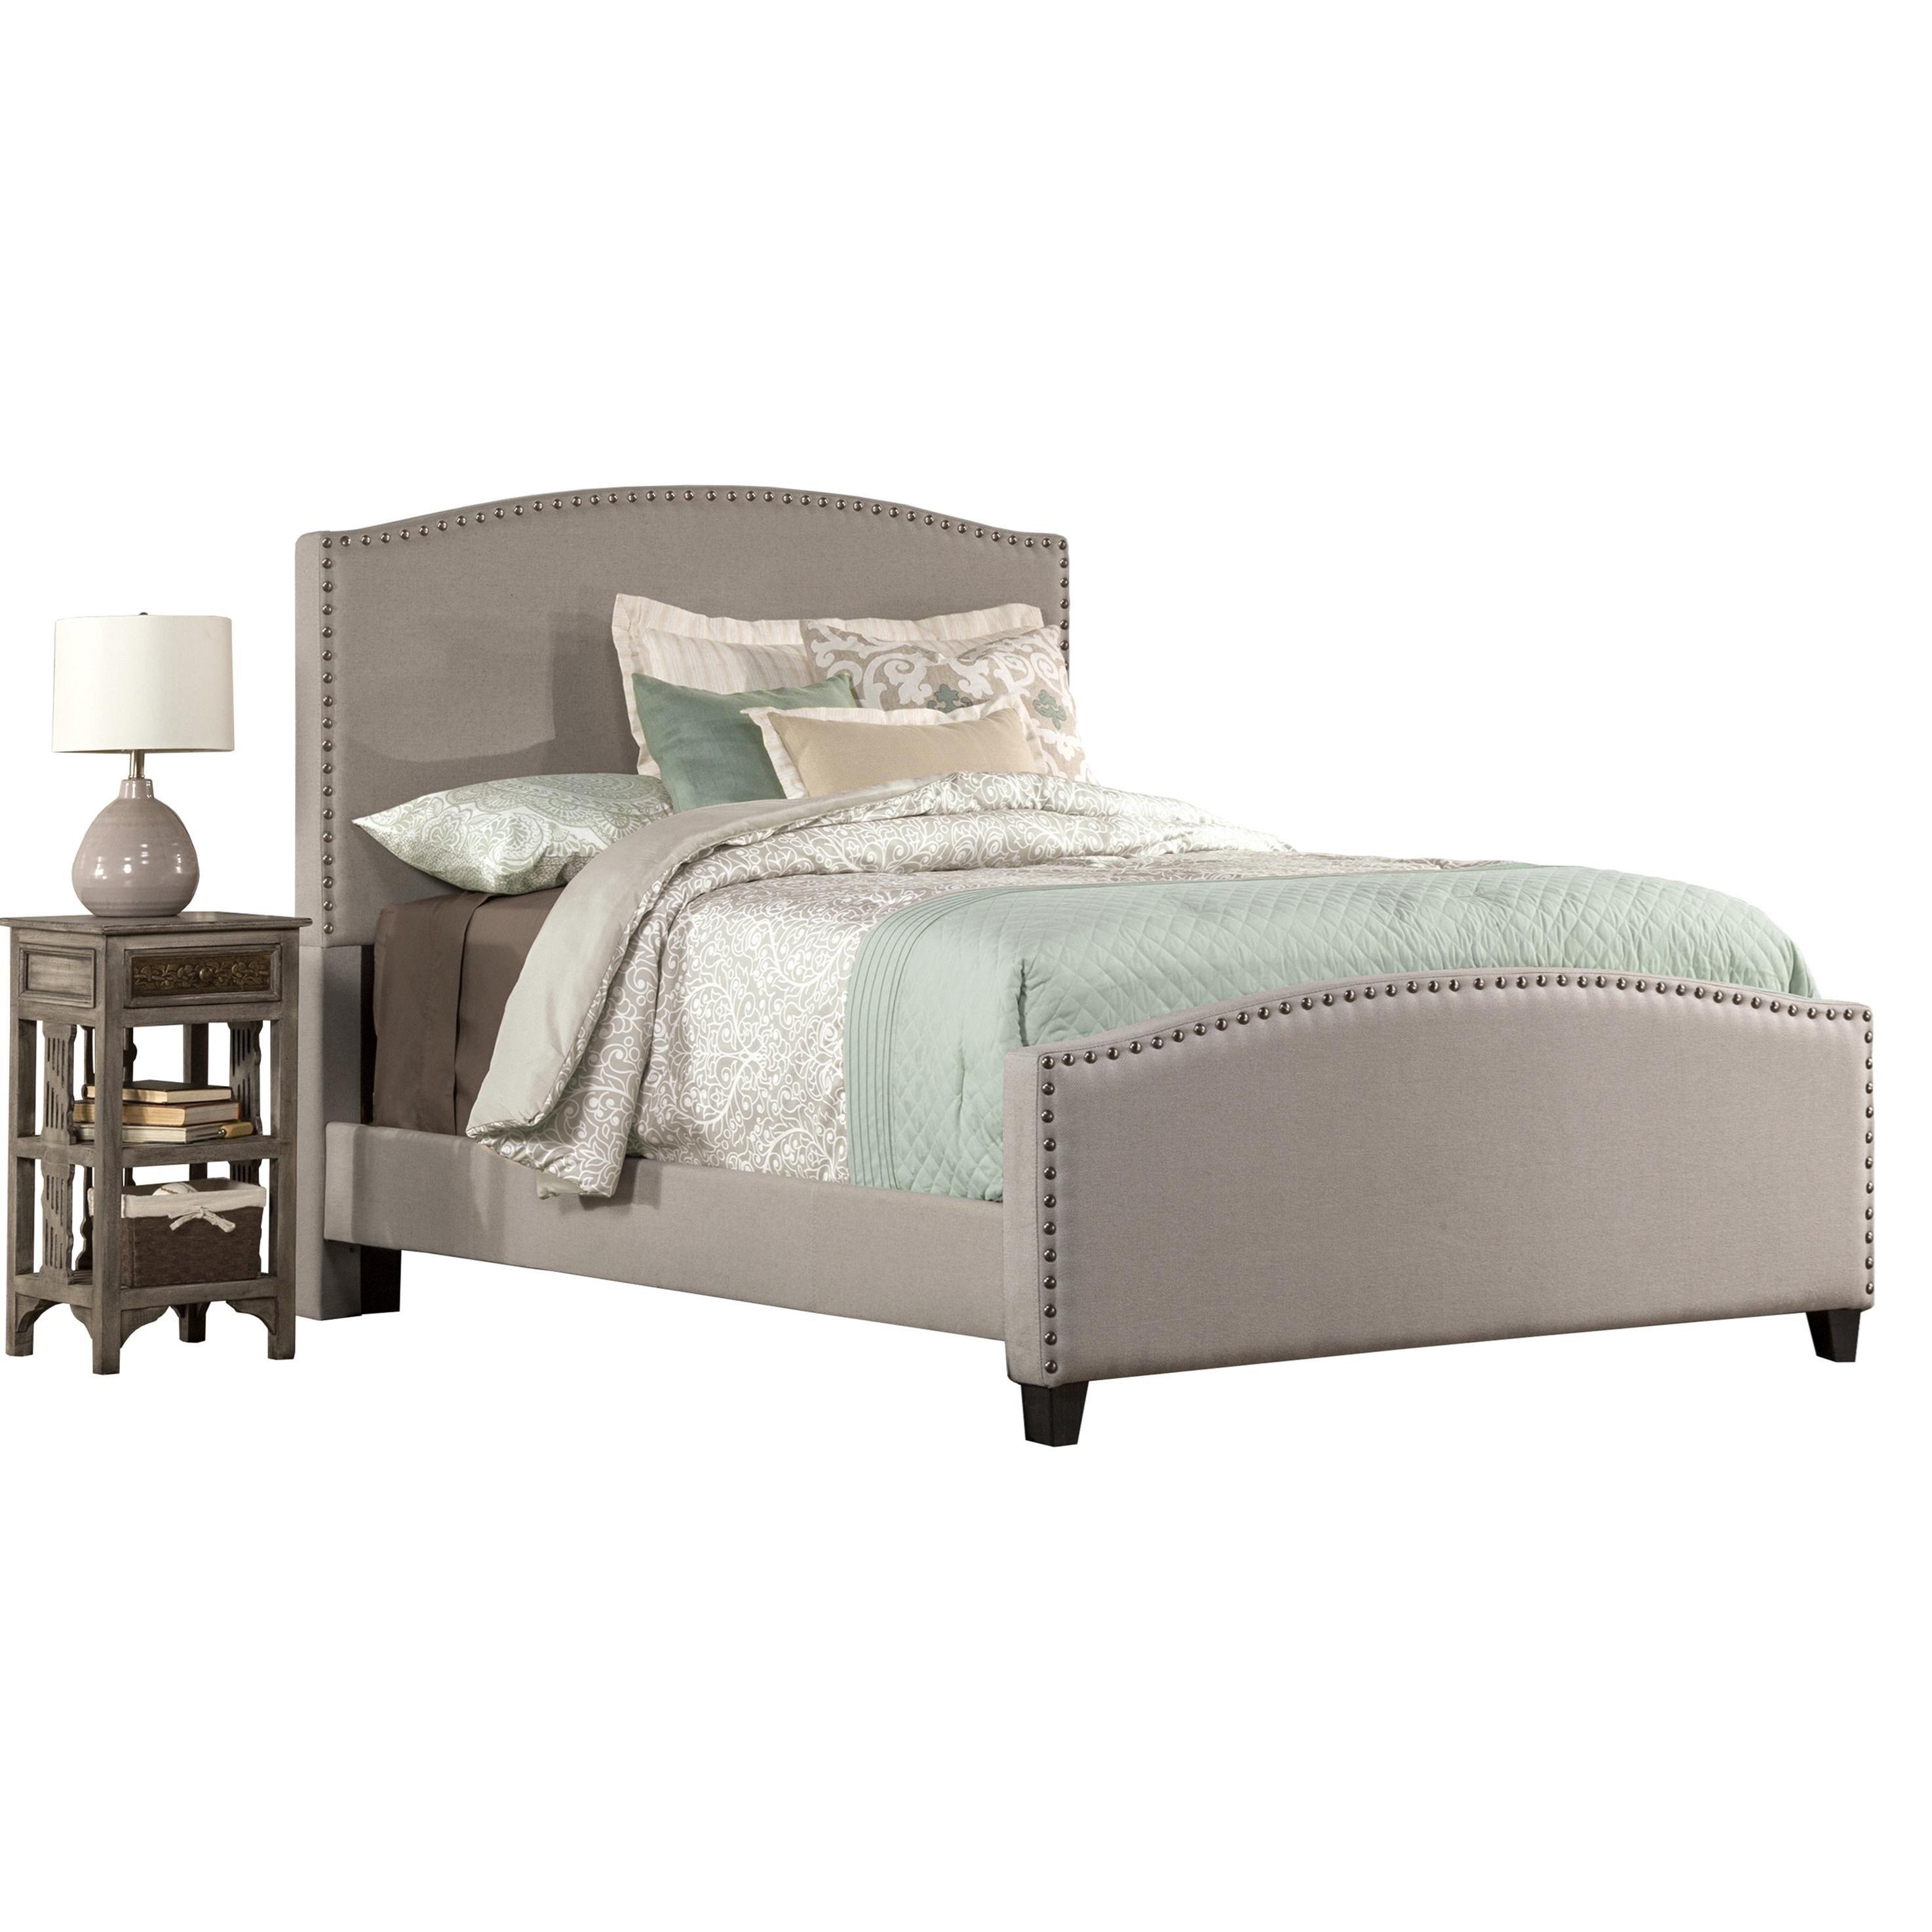 Hillsdale Kerstein Full Bed Set Rails Included - Item Number: 1932BFR